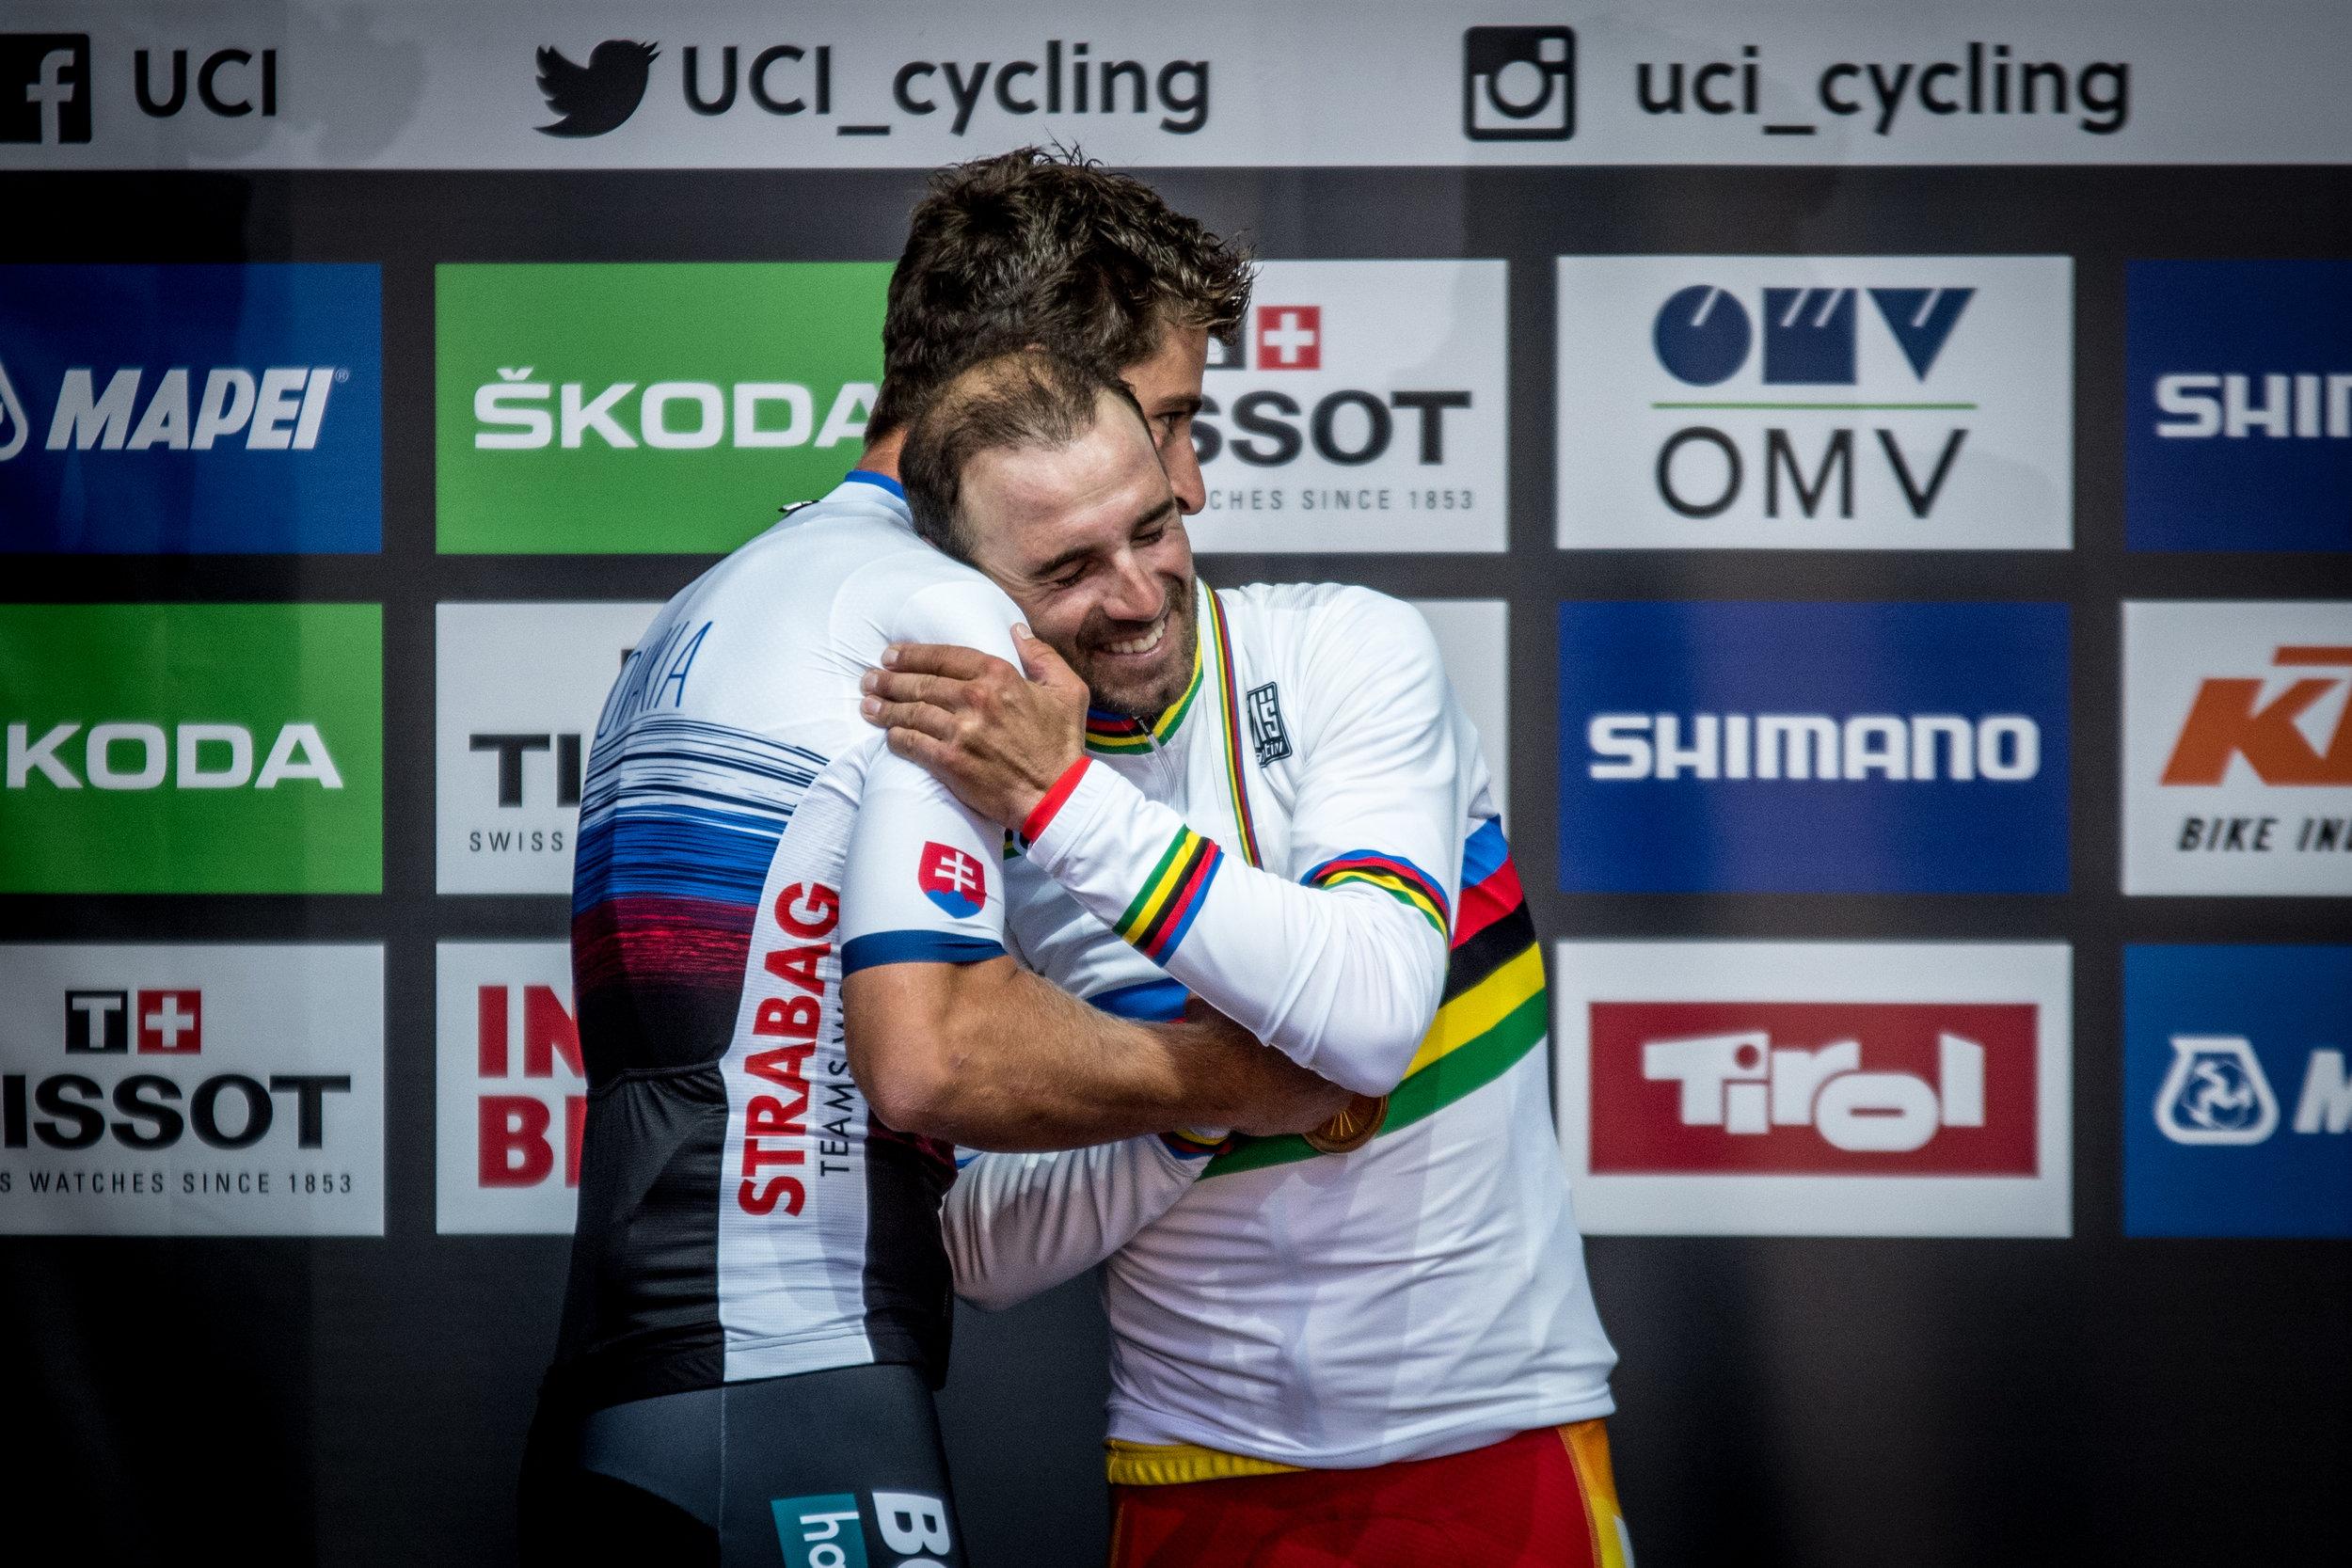 Three time World Champion Peter Sagan hands the rainbow jersey over to 2018 winner, Alejandro Valverde.